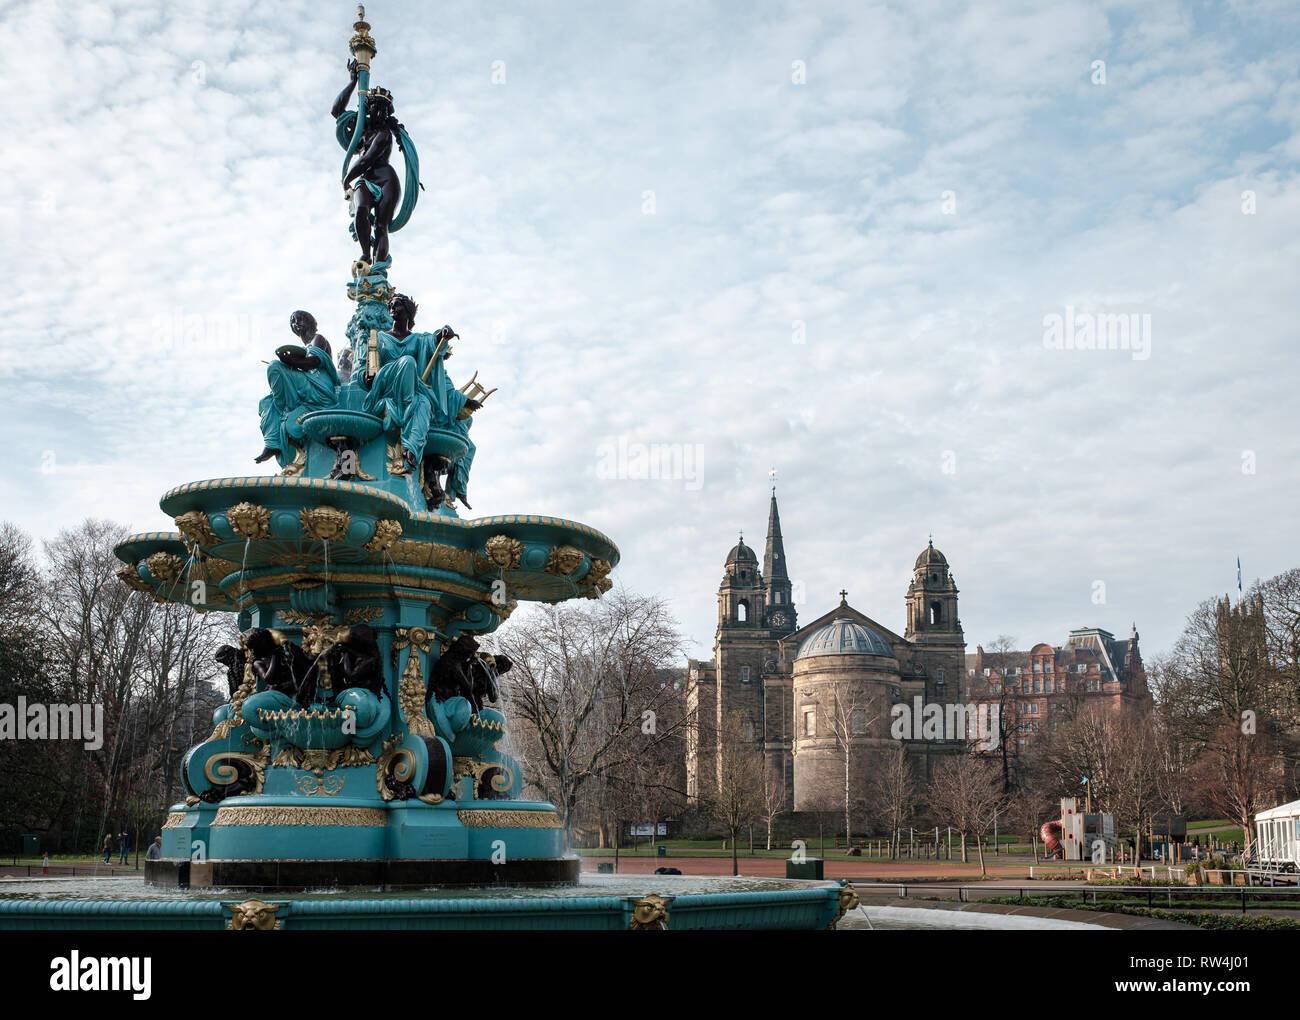 The famous Ross Fountain landmark in Princes Street gardens in Edinburgh city centre, Scotland Stock Photo